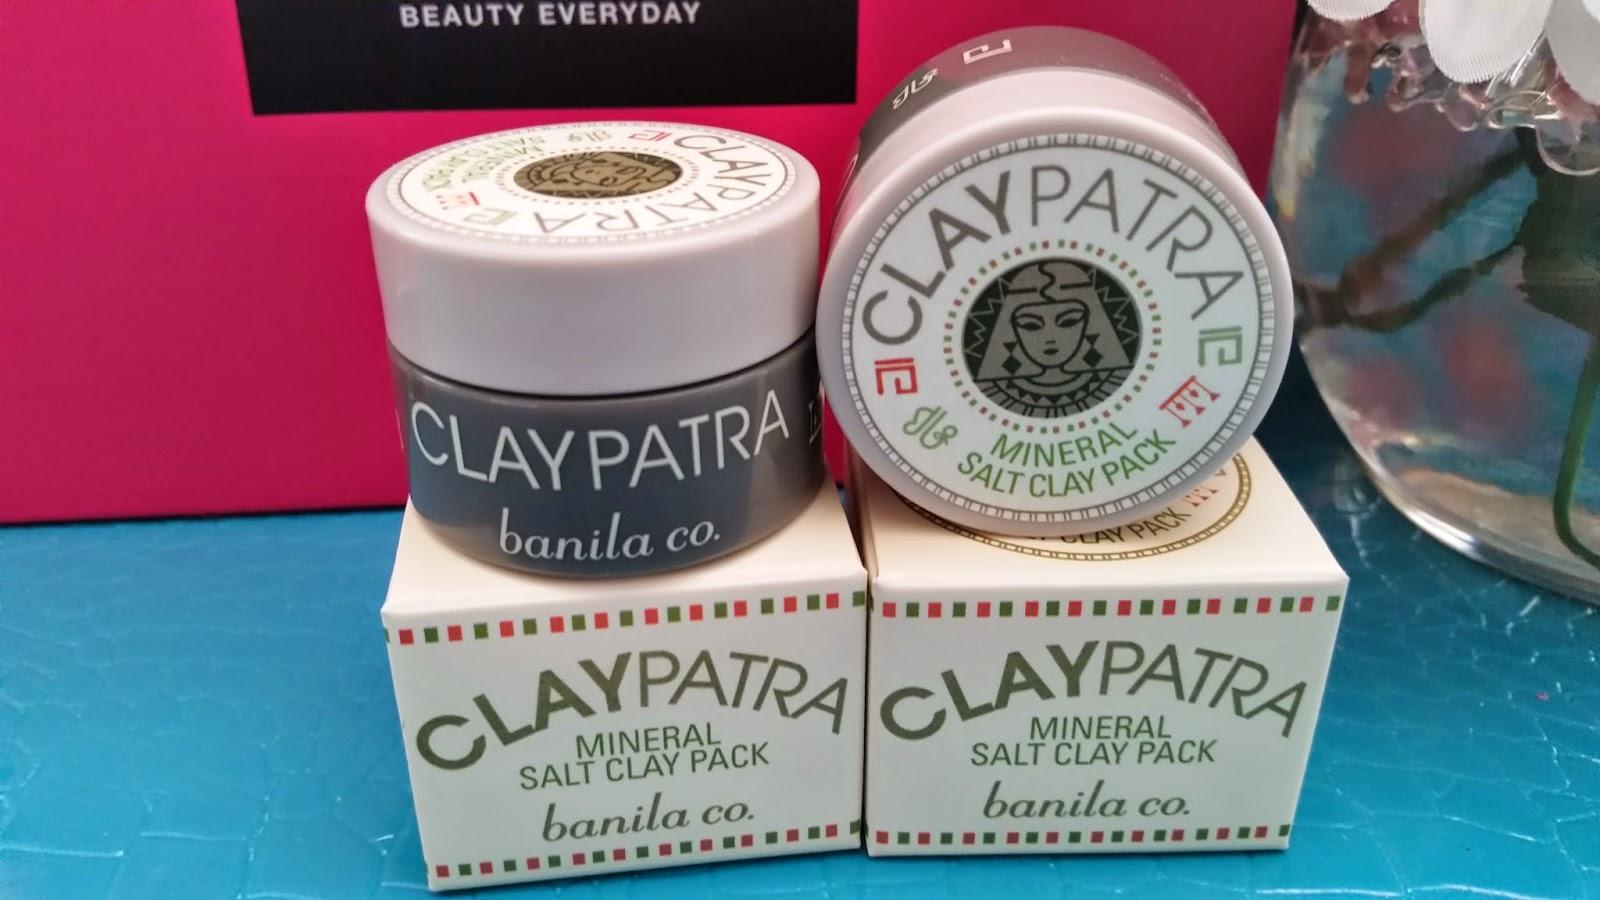 Banila Co. Claypatra Mineral Salt Clay Pack